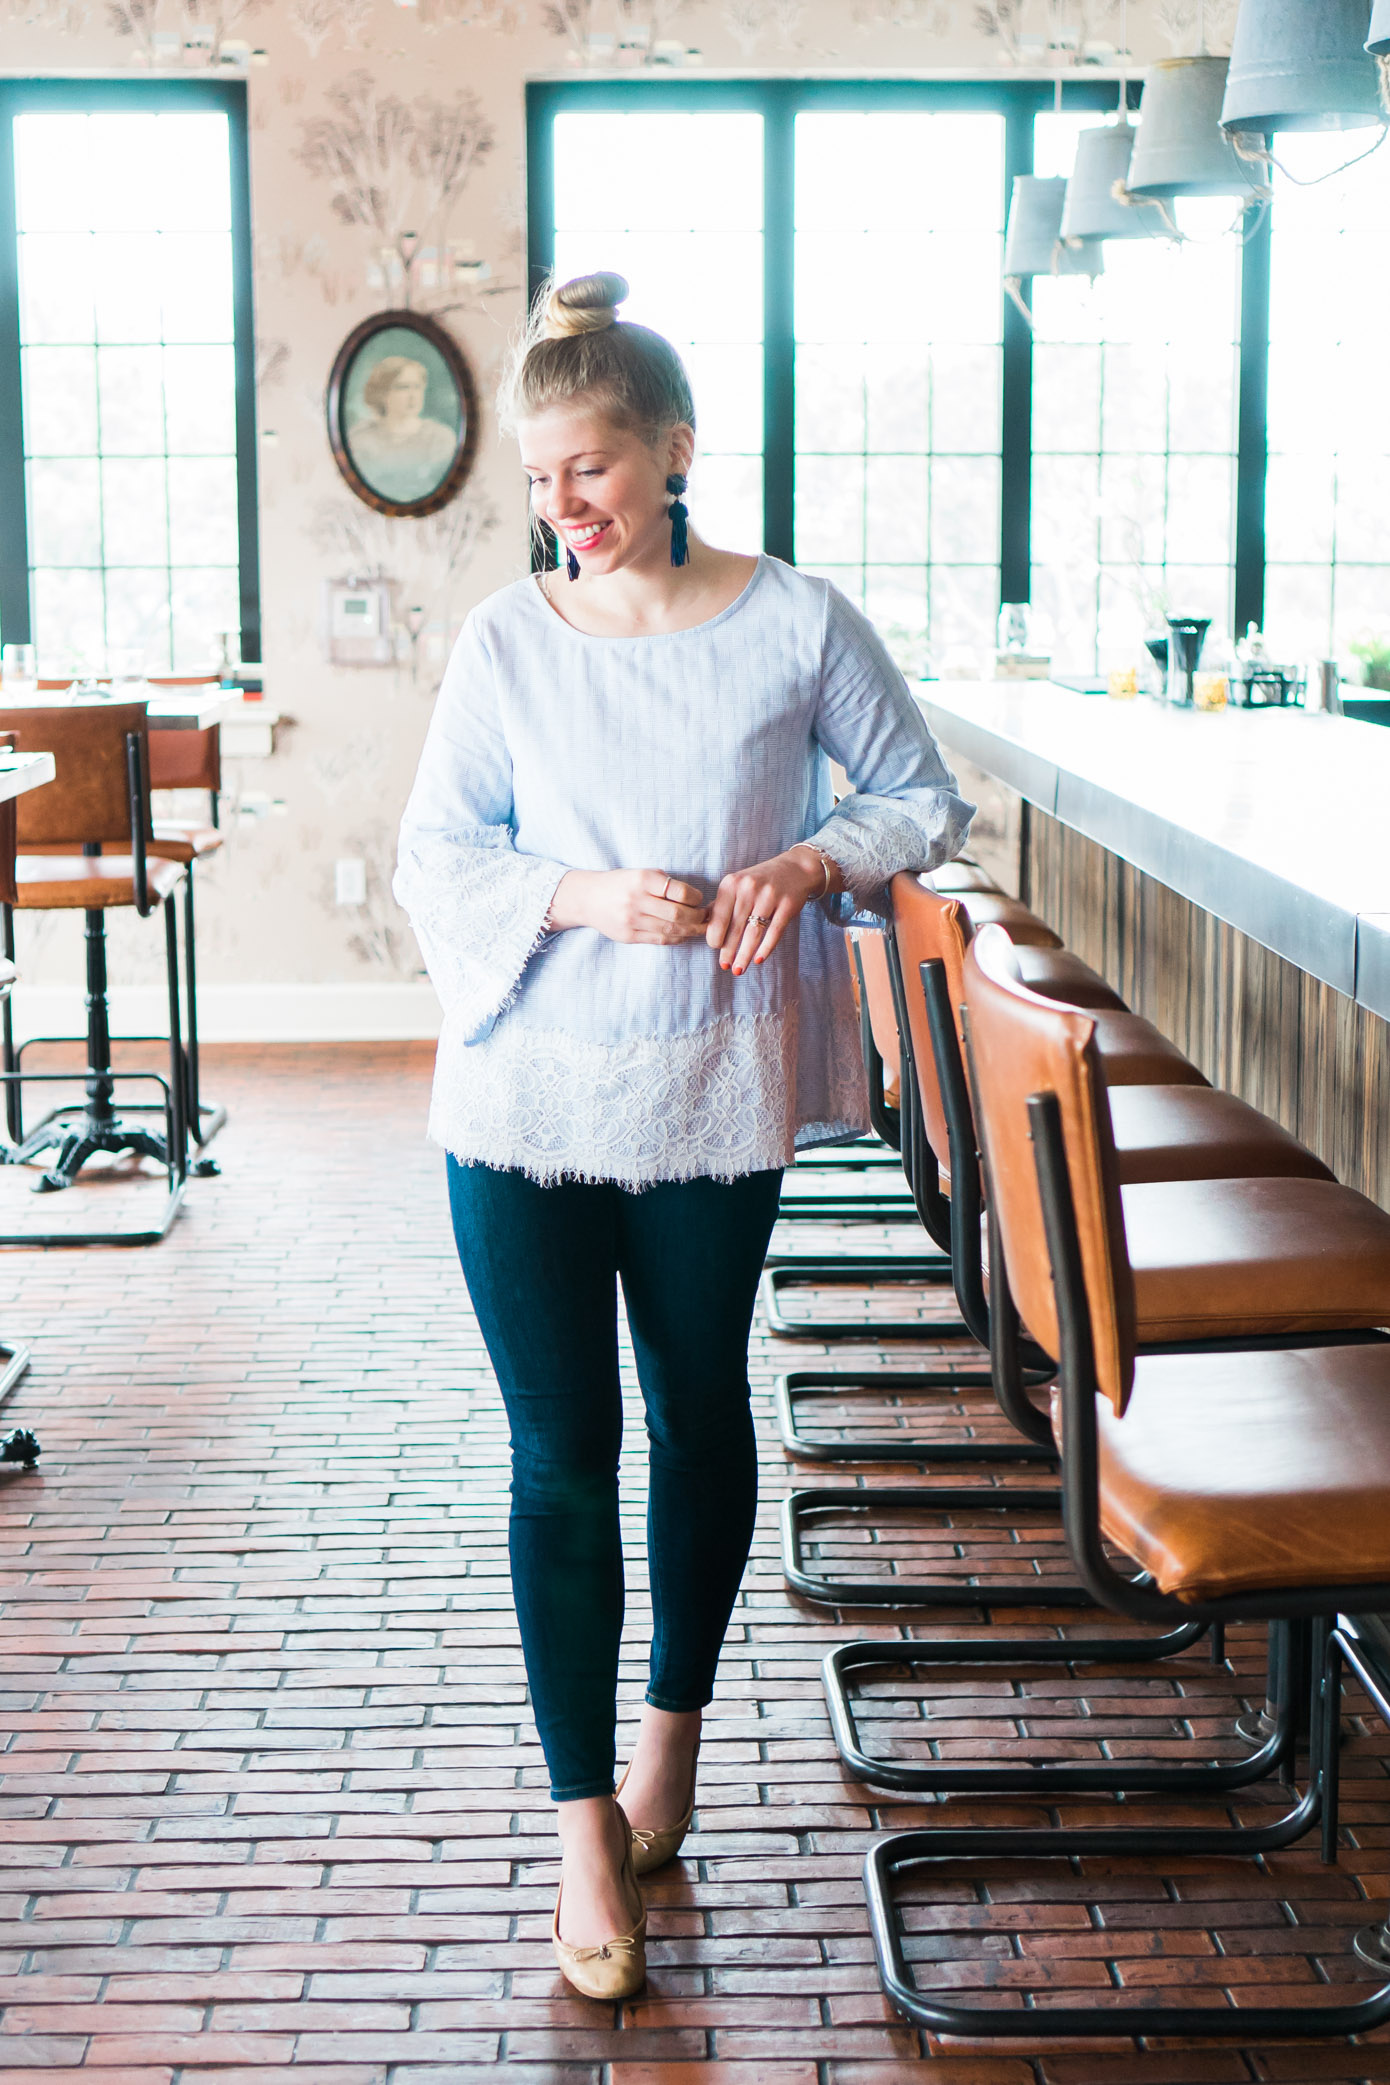 Charlottesville VA Travel Guide   Where to Eat in Charlottesville VA   Louella Reese Life & Style Blog